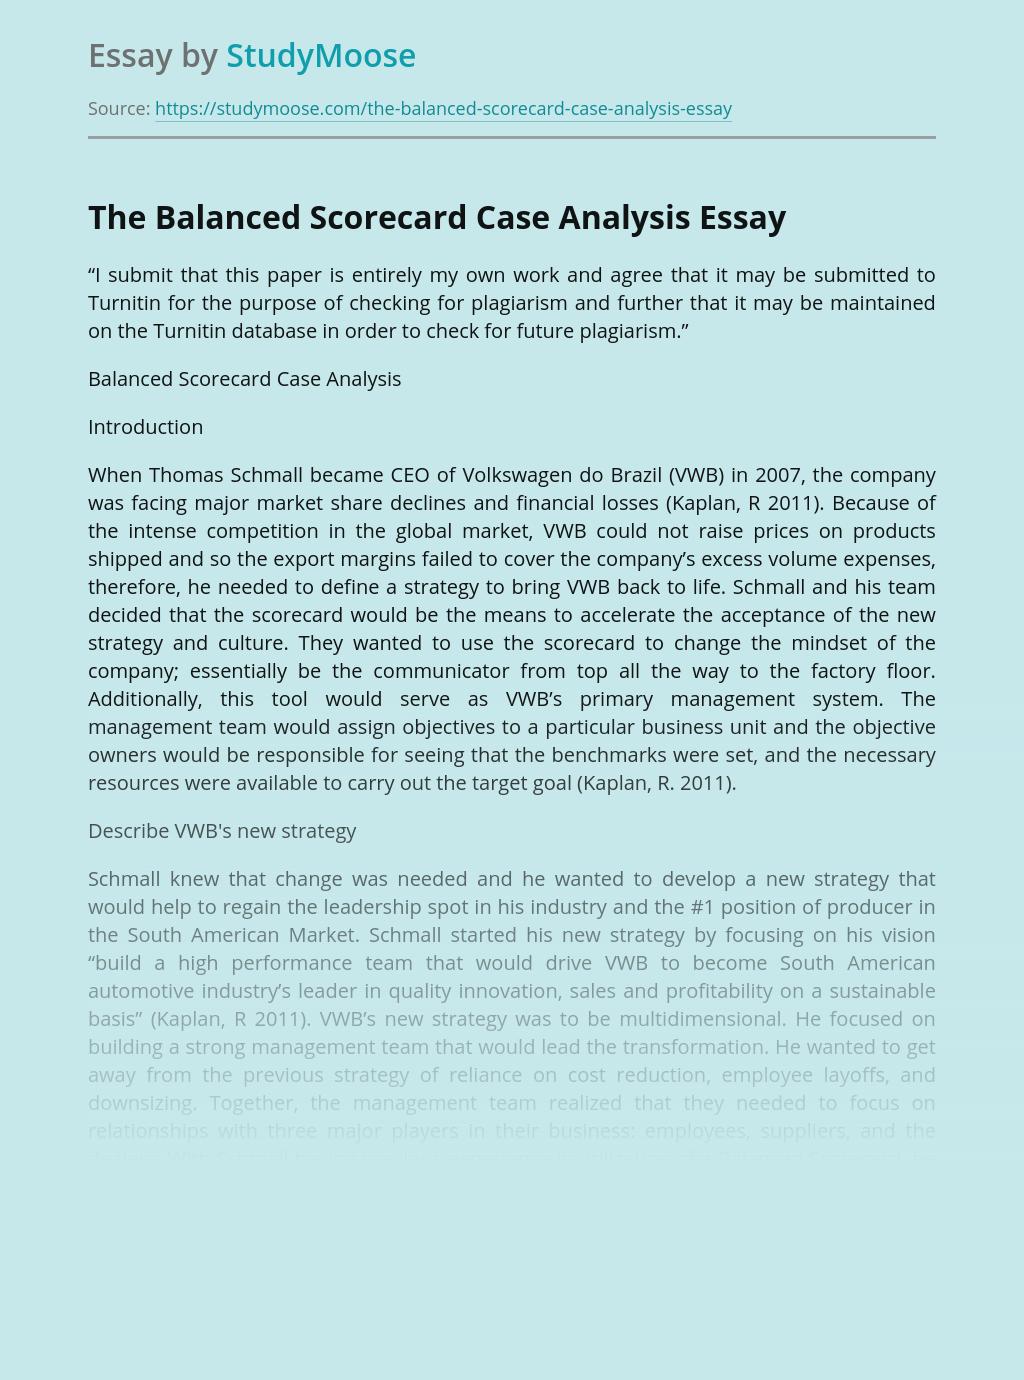 The Balanced Scorecard Case Analysis